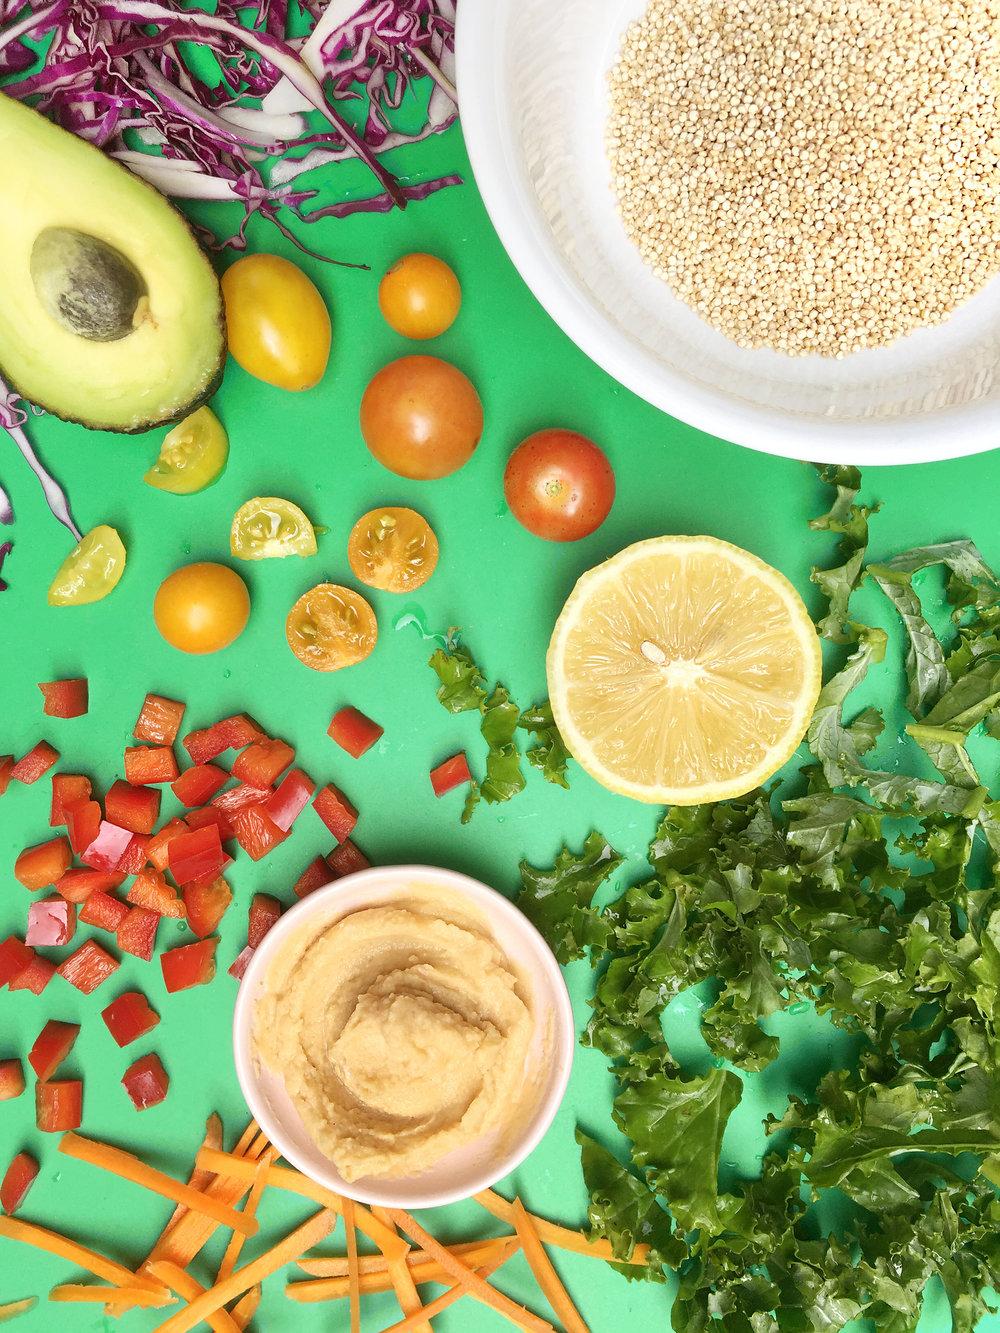 amy_chen_design_quinoa_bowl_recipe_ingredients_2.jpg